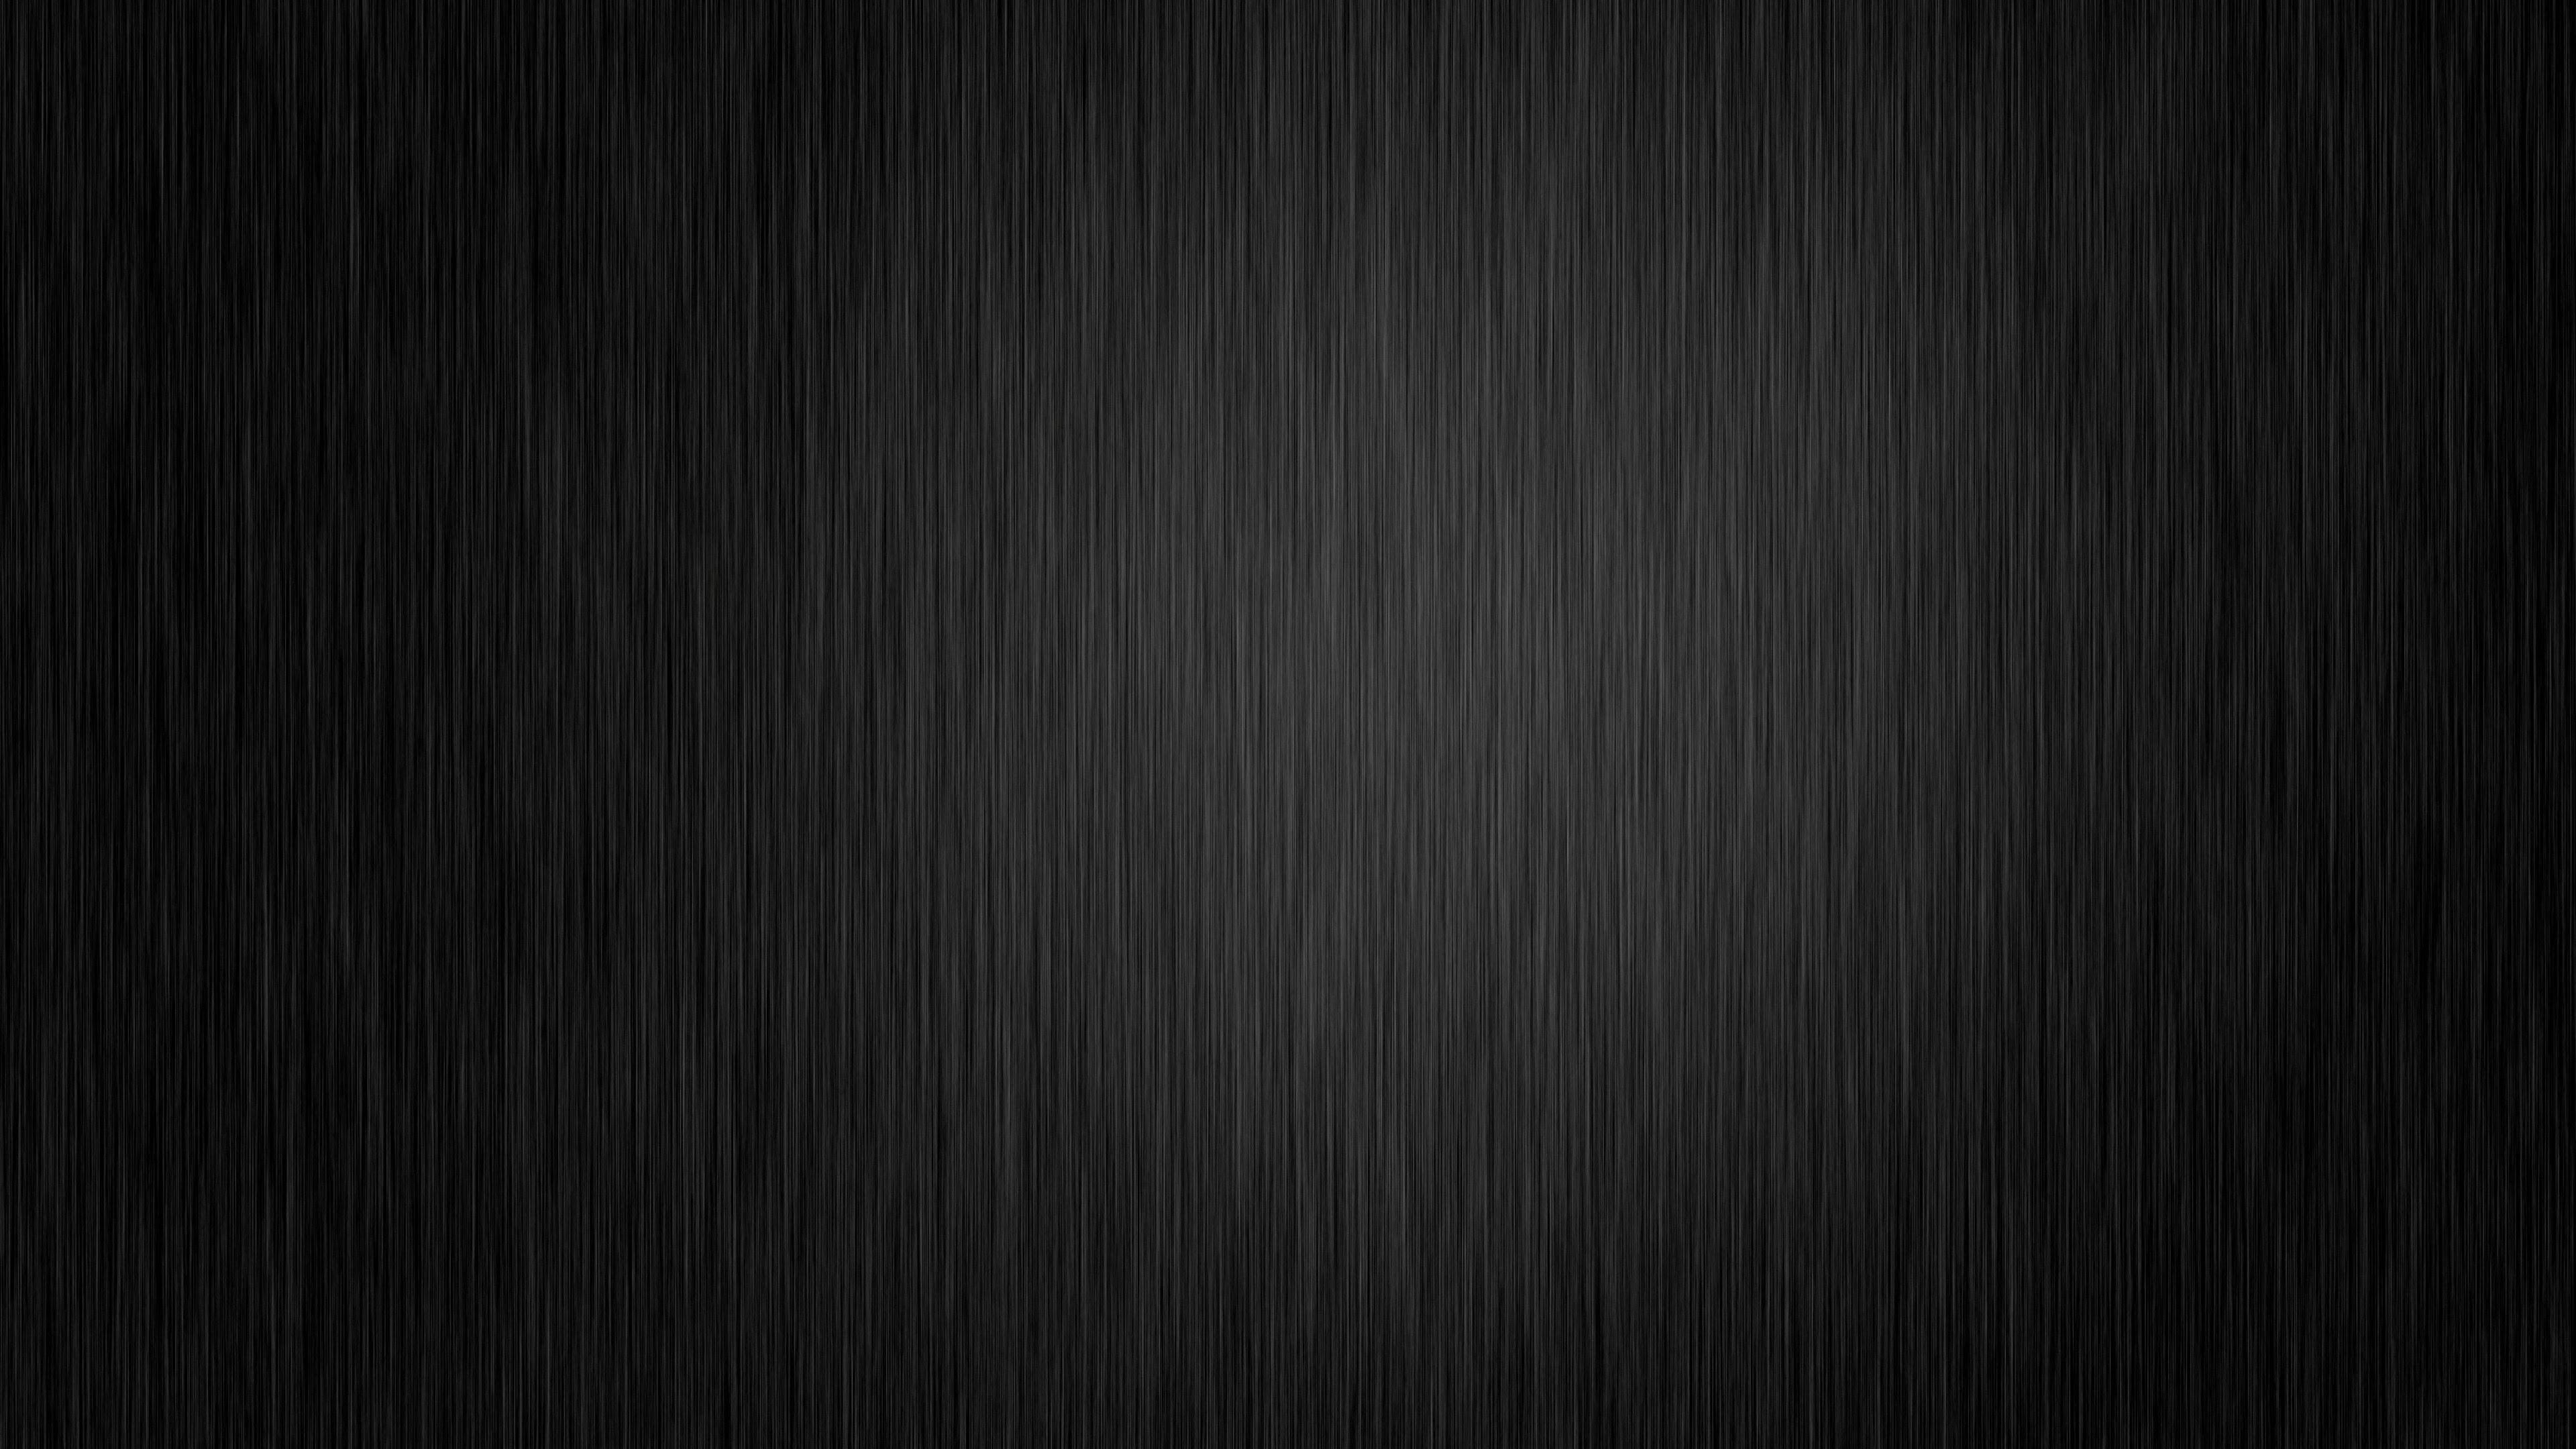 Black Background Hd 4k Wallpapers Get Images